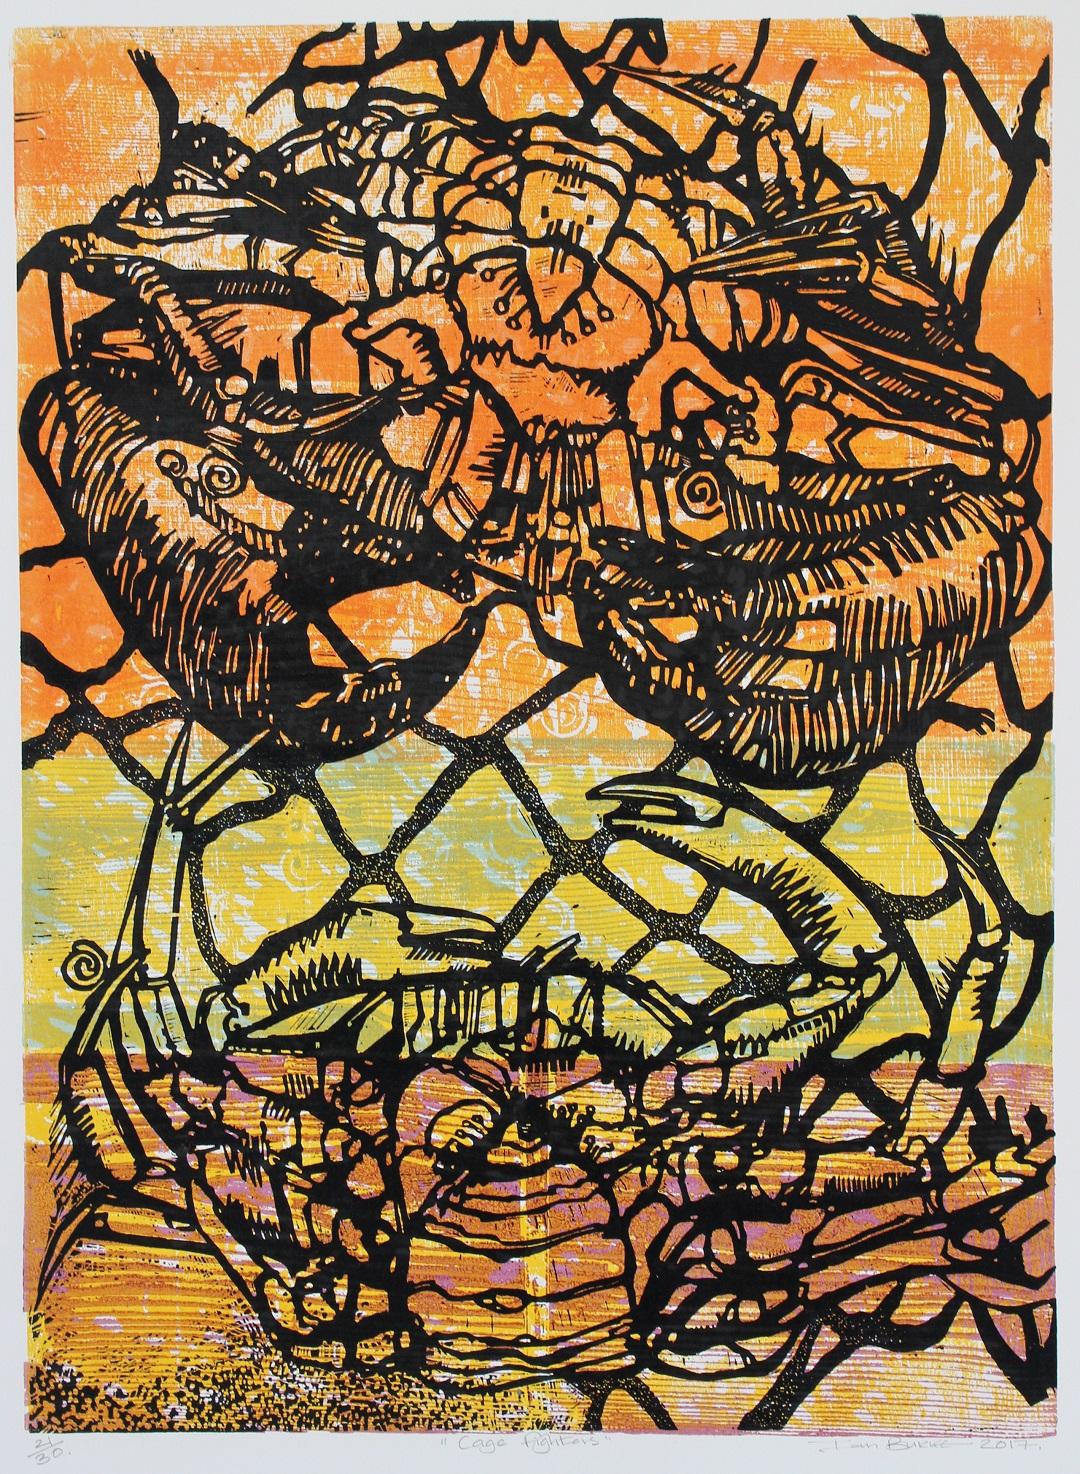 'Cage Fighters' Ian Burke Woodblock print, 55cm x 85cm, 2018